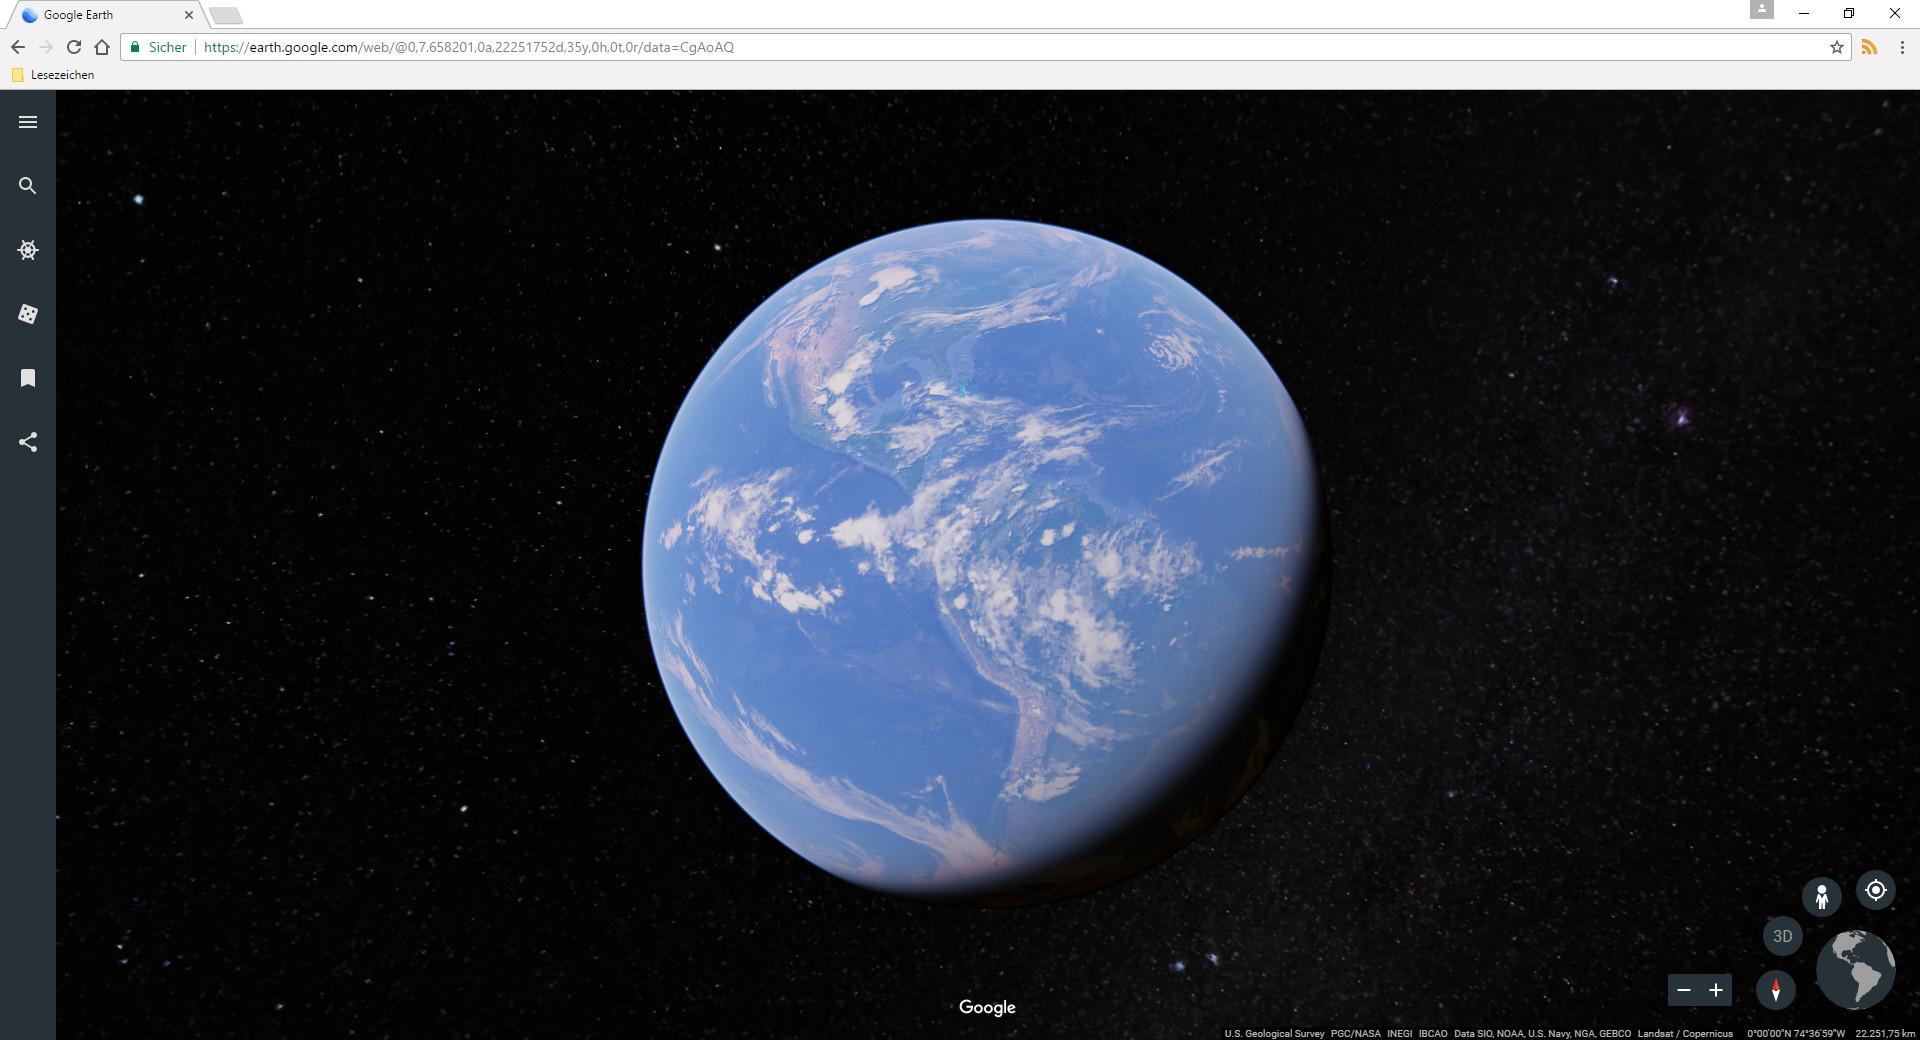 Screenshot 1 - Google Earth online